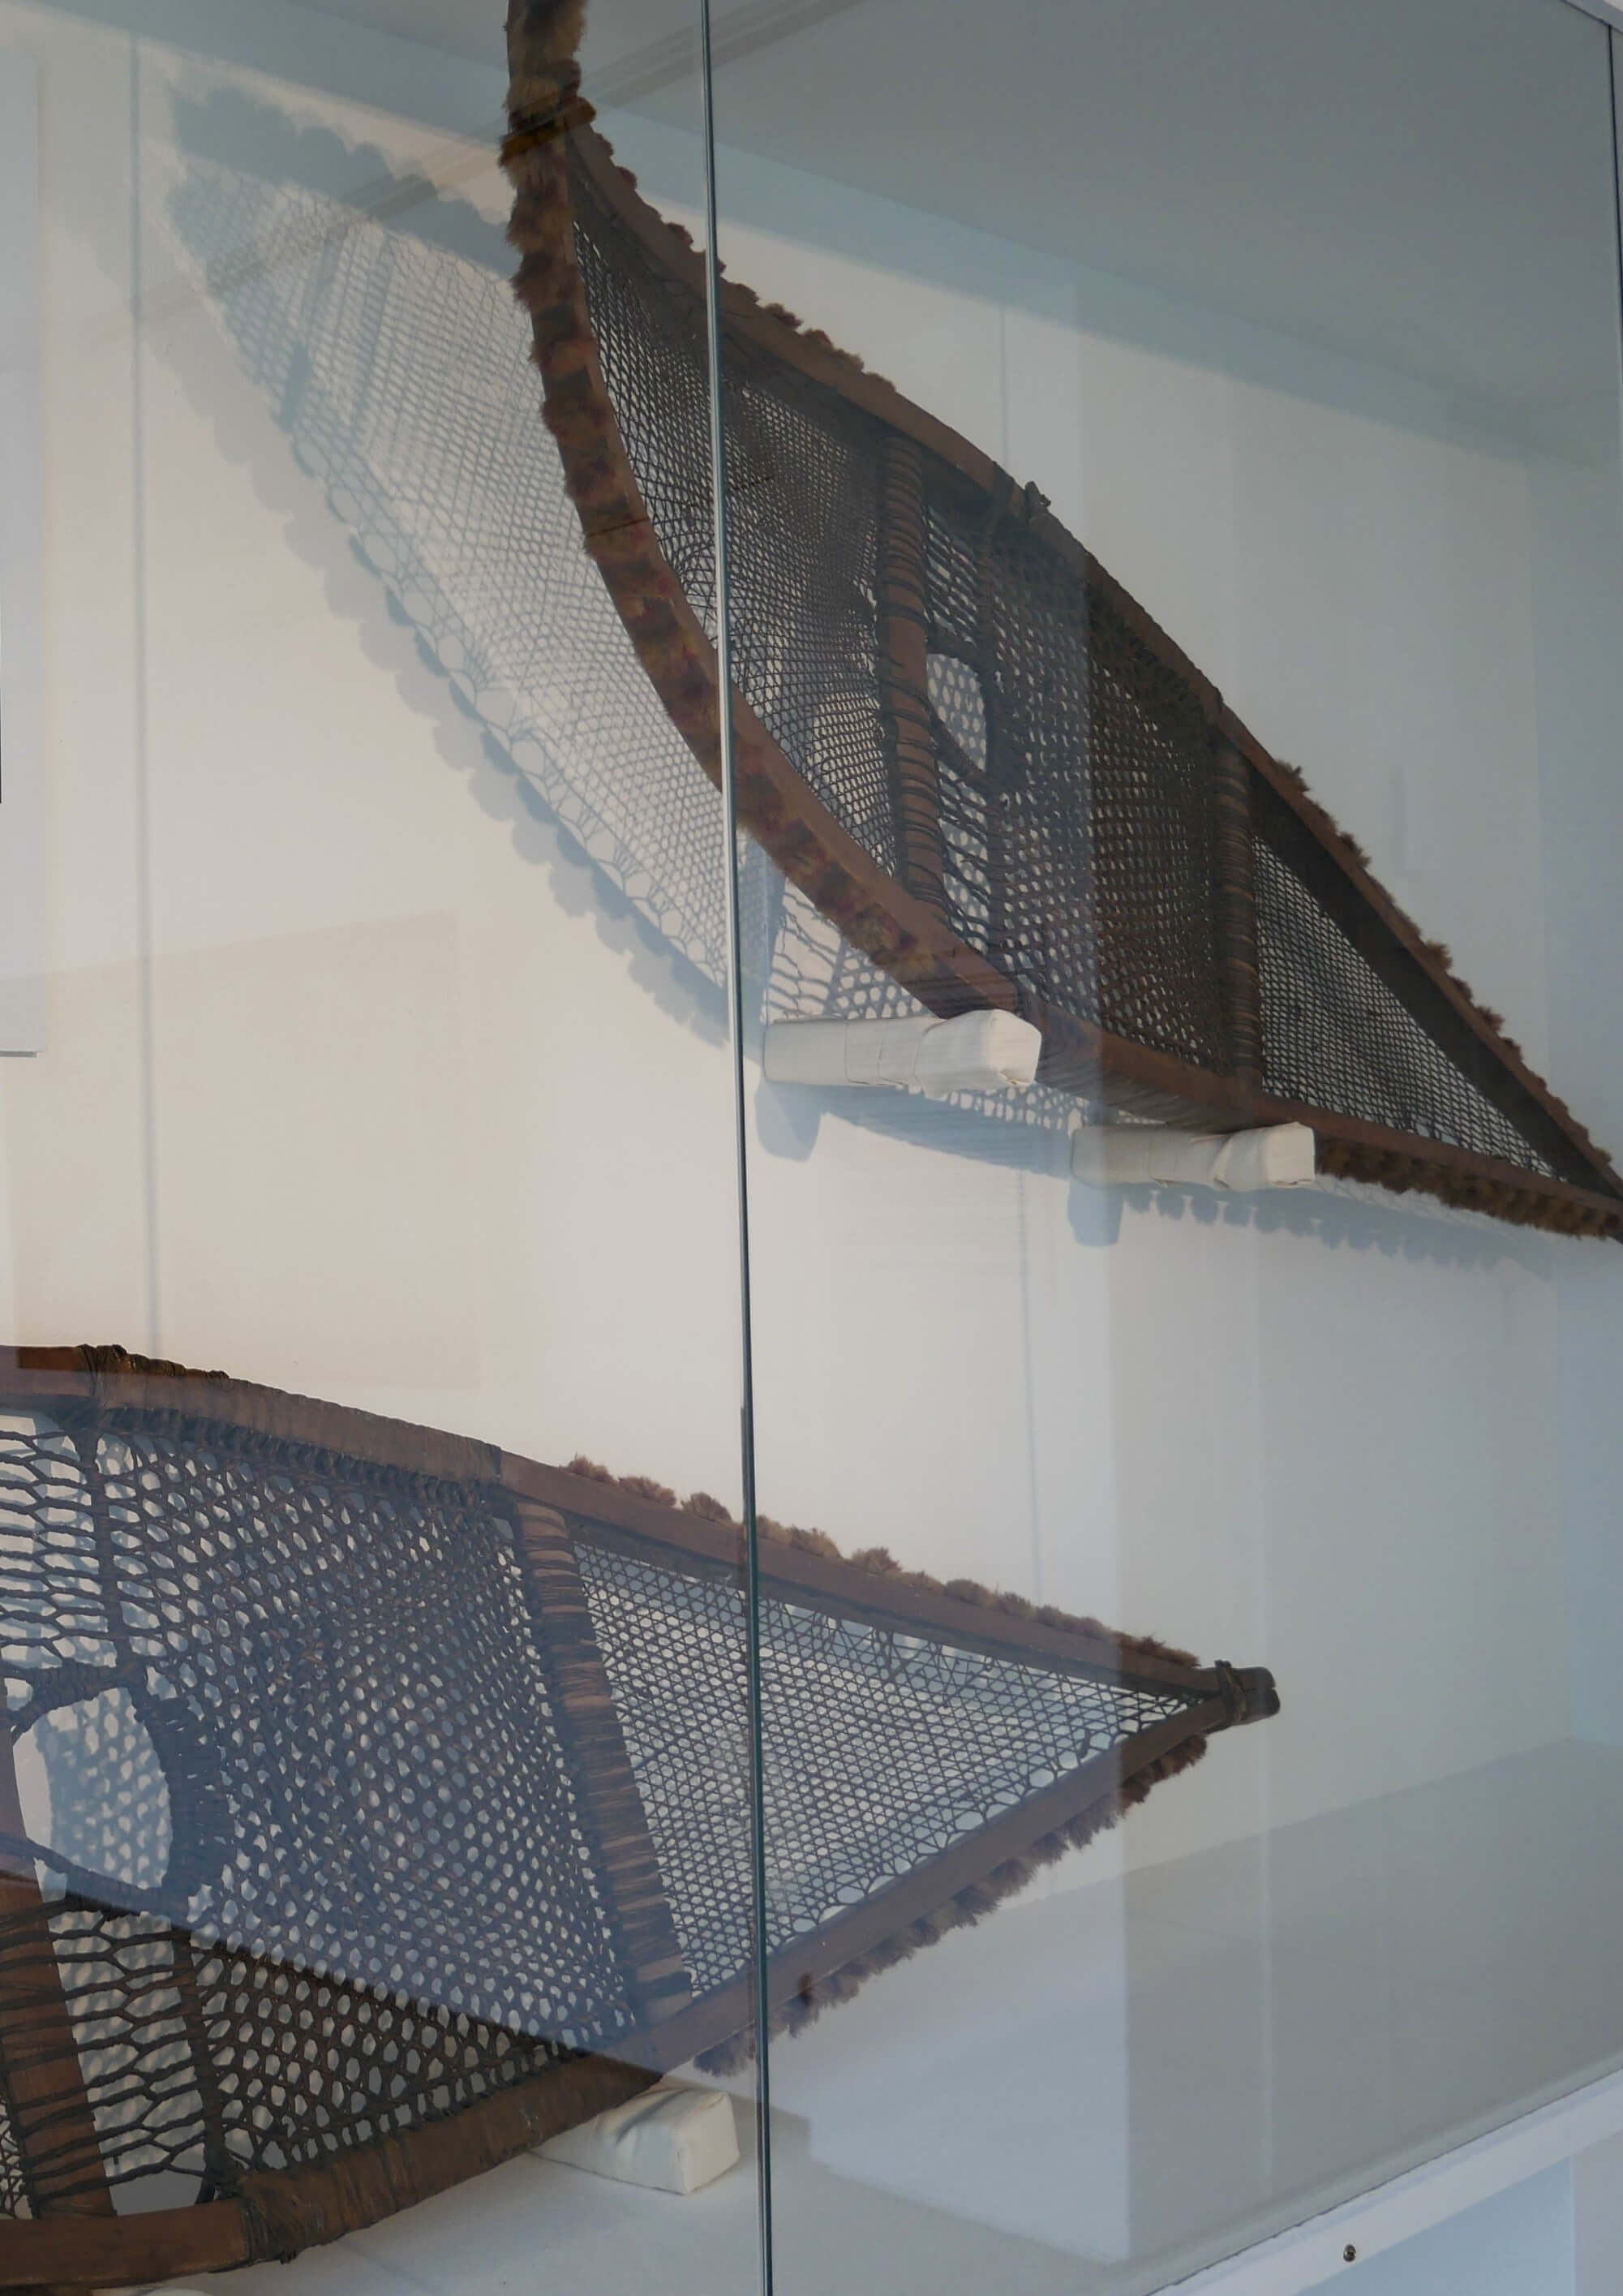 Arctic explorer J Rae's snowshoes, Stromness Museum, Orkney Islands, Scotland, UK